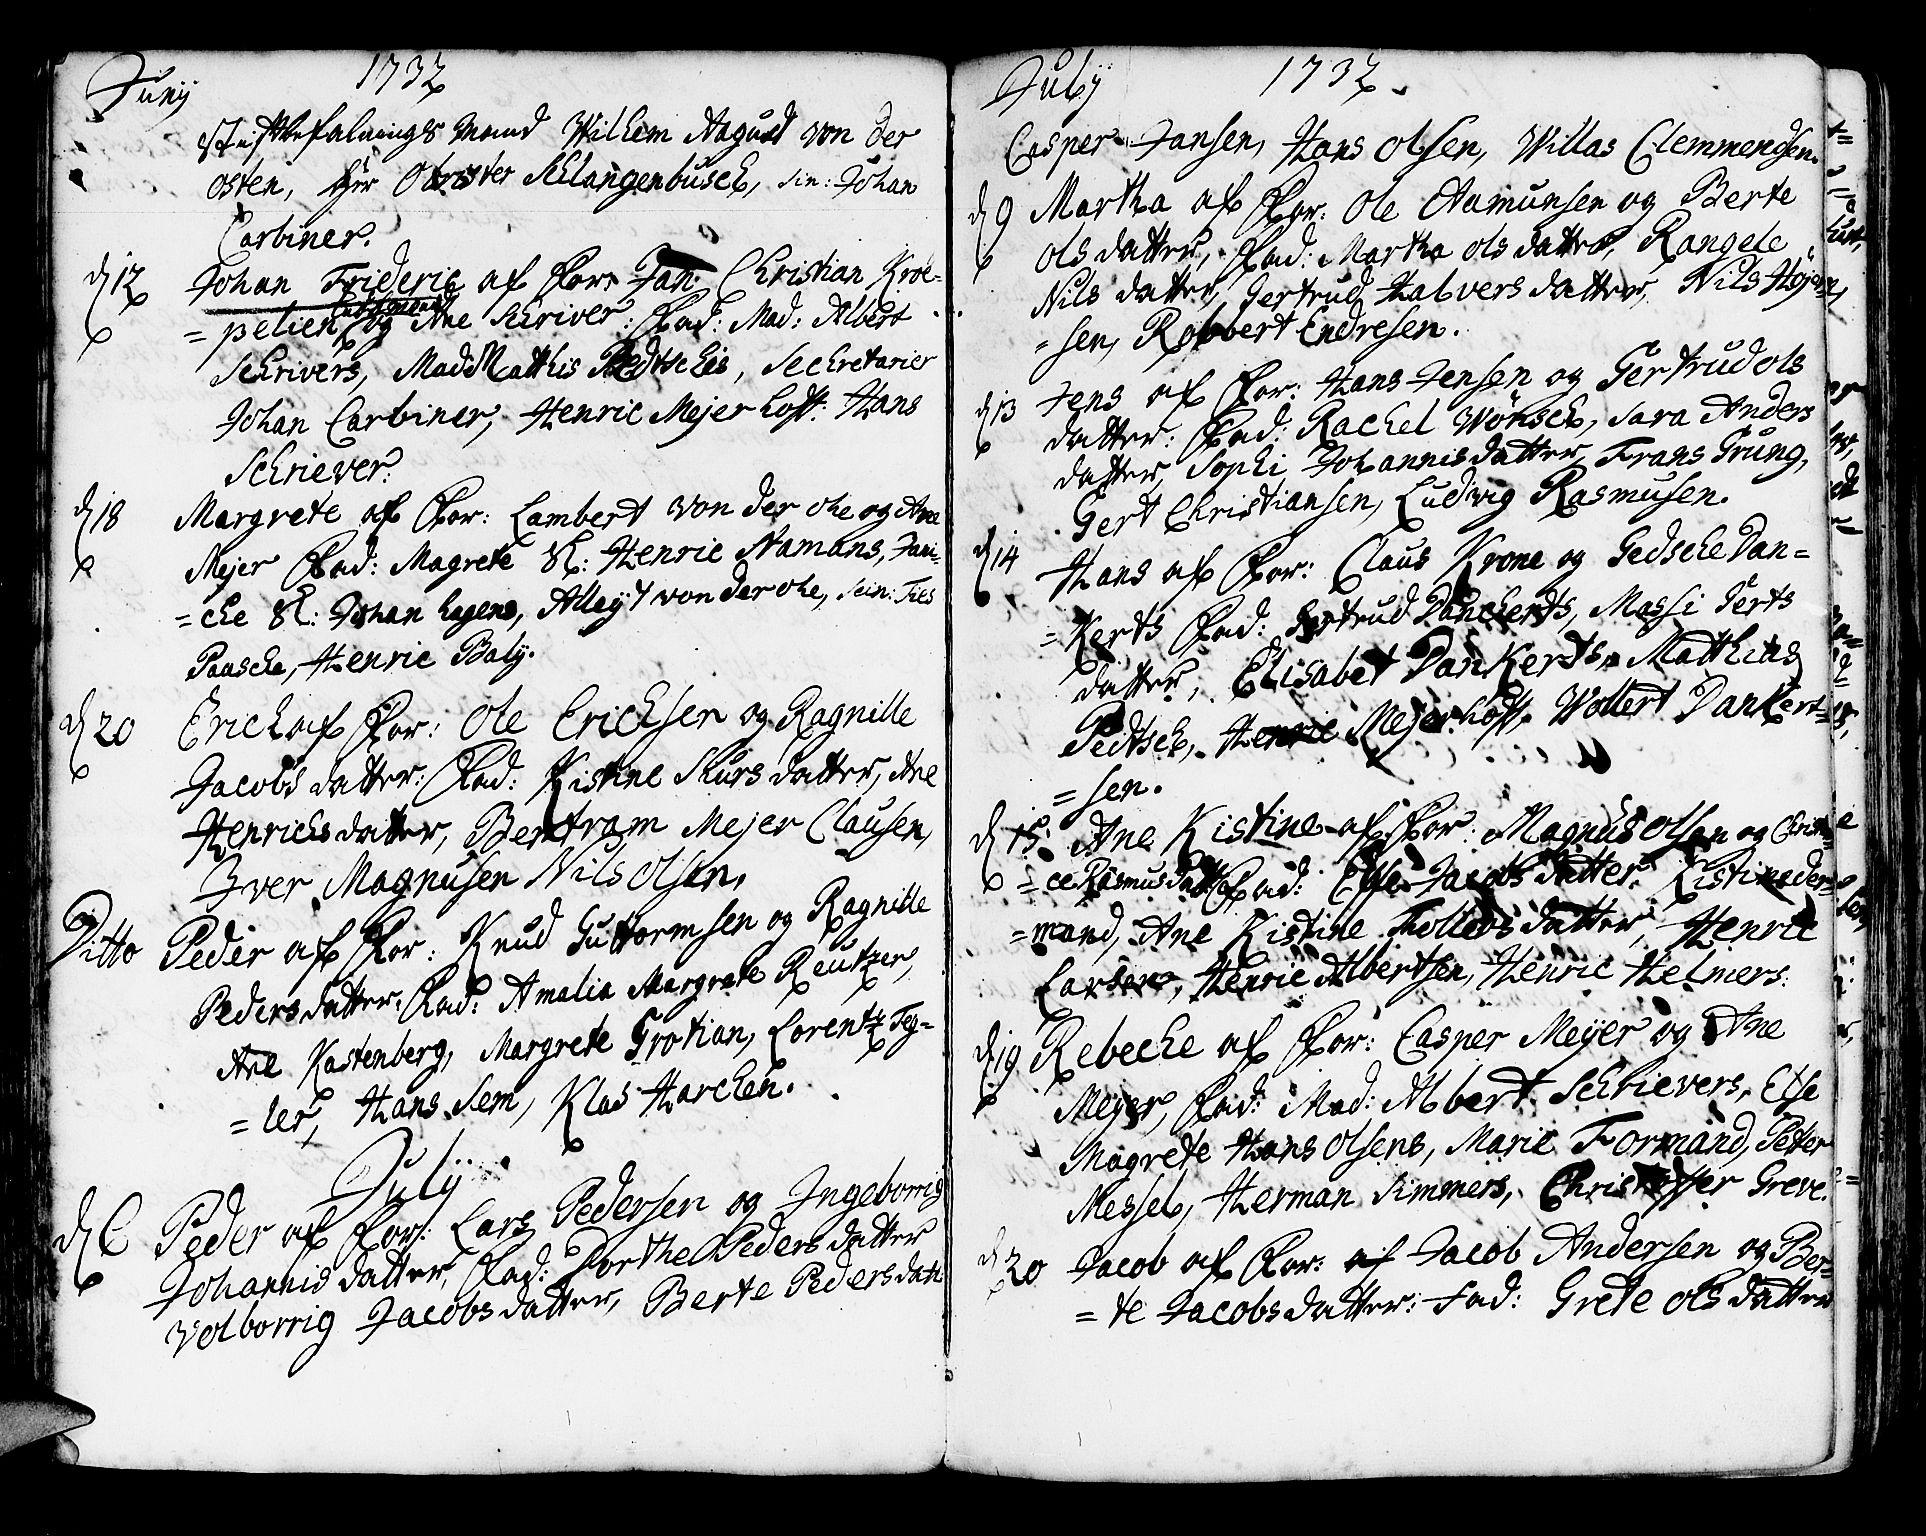 SAB, Korskirken Sokneprestembete, H/Haa/L0004: Ministerialbok nr. A 4, 1720-1750, s. 112